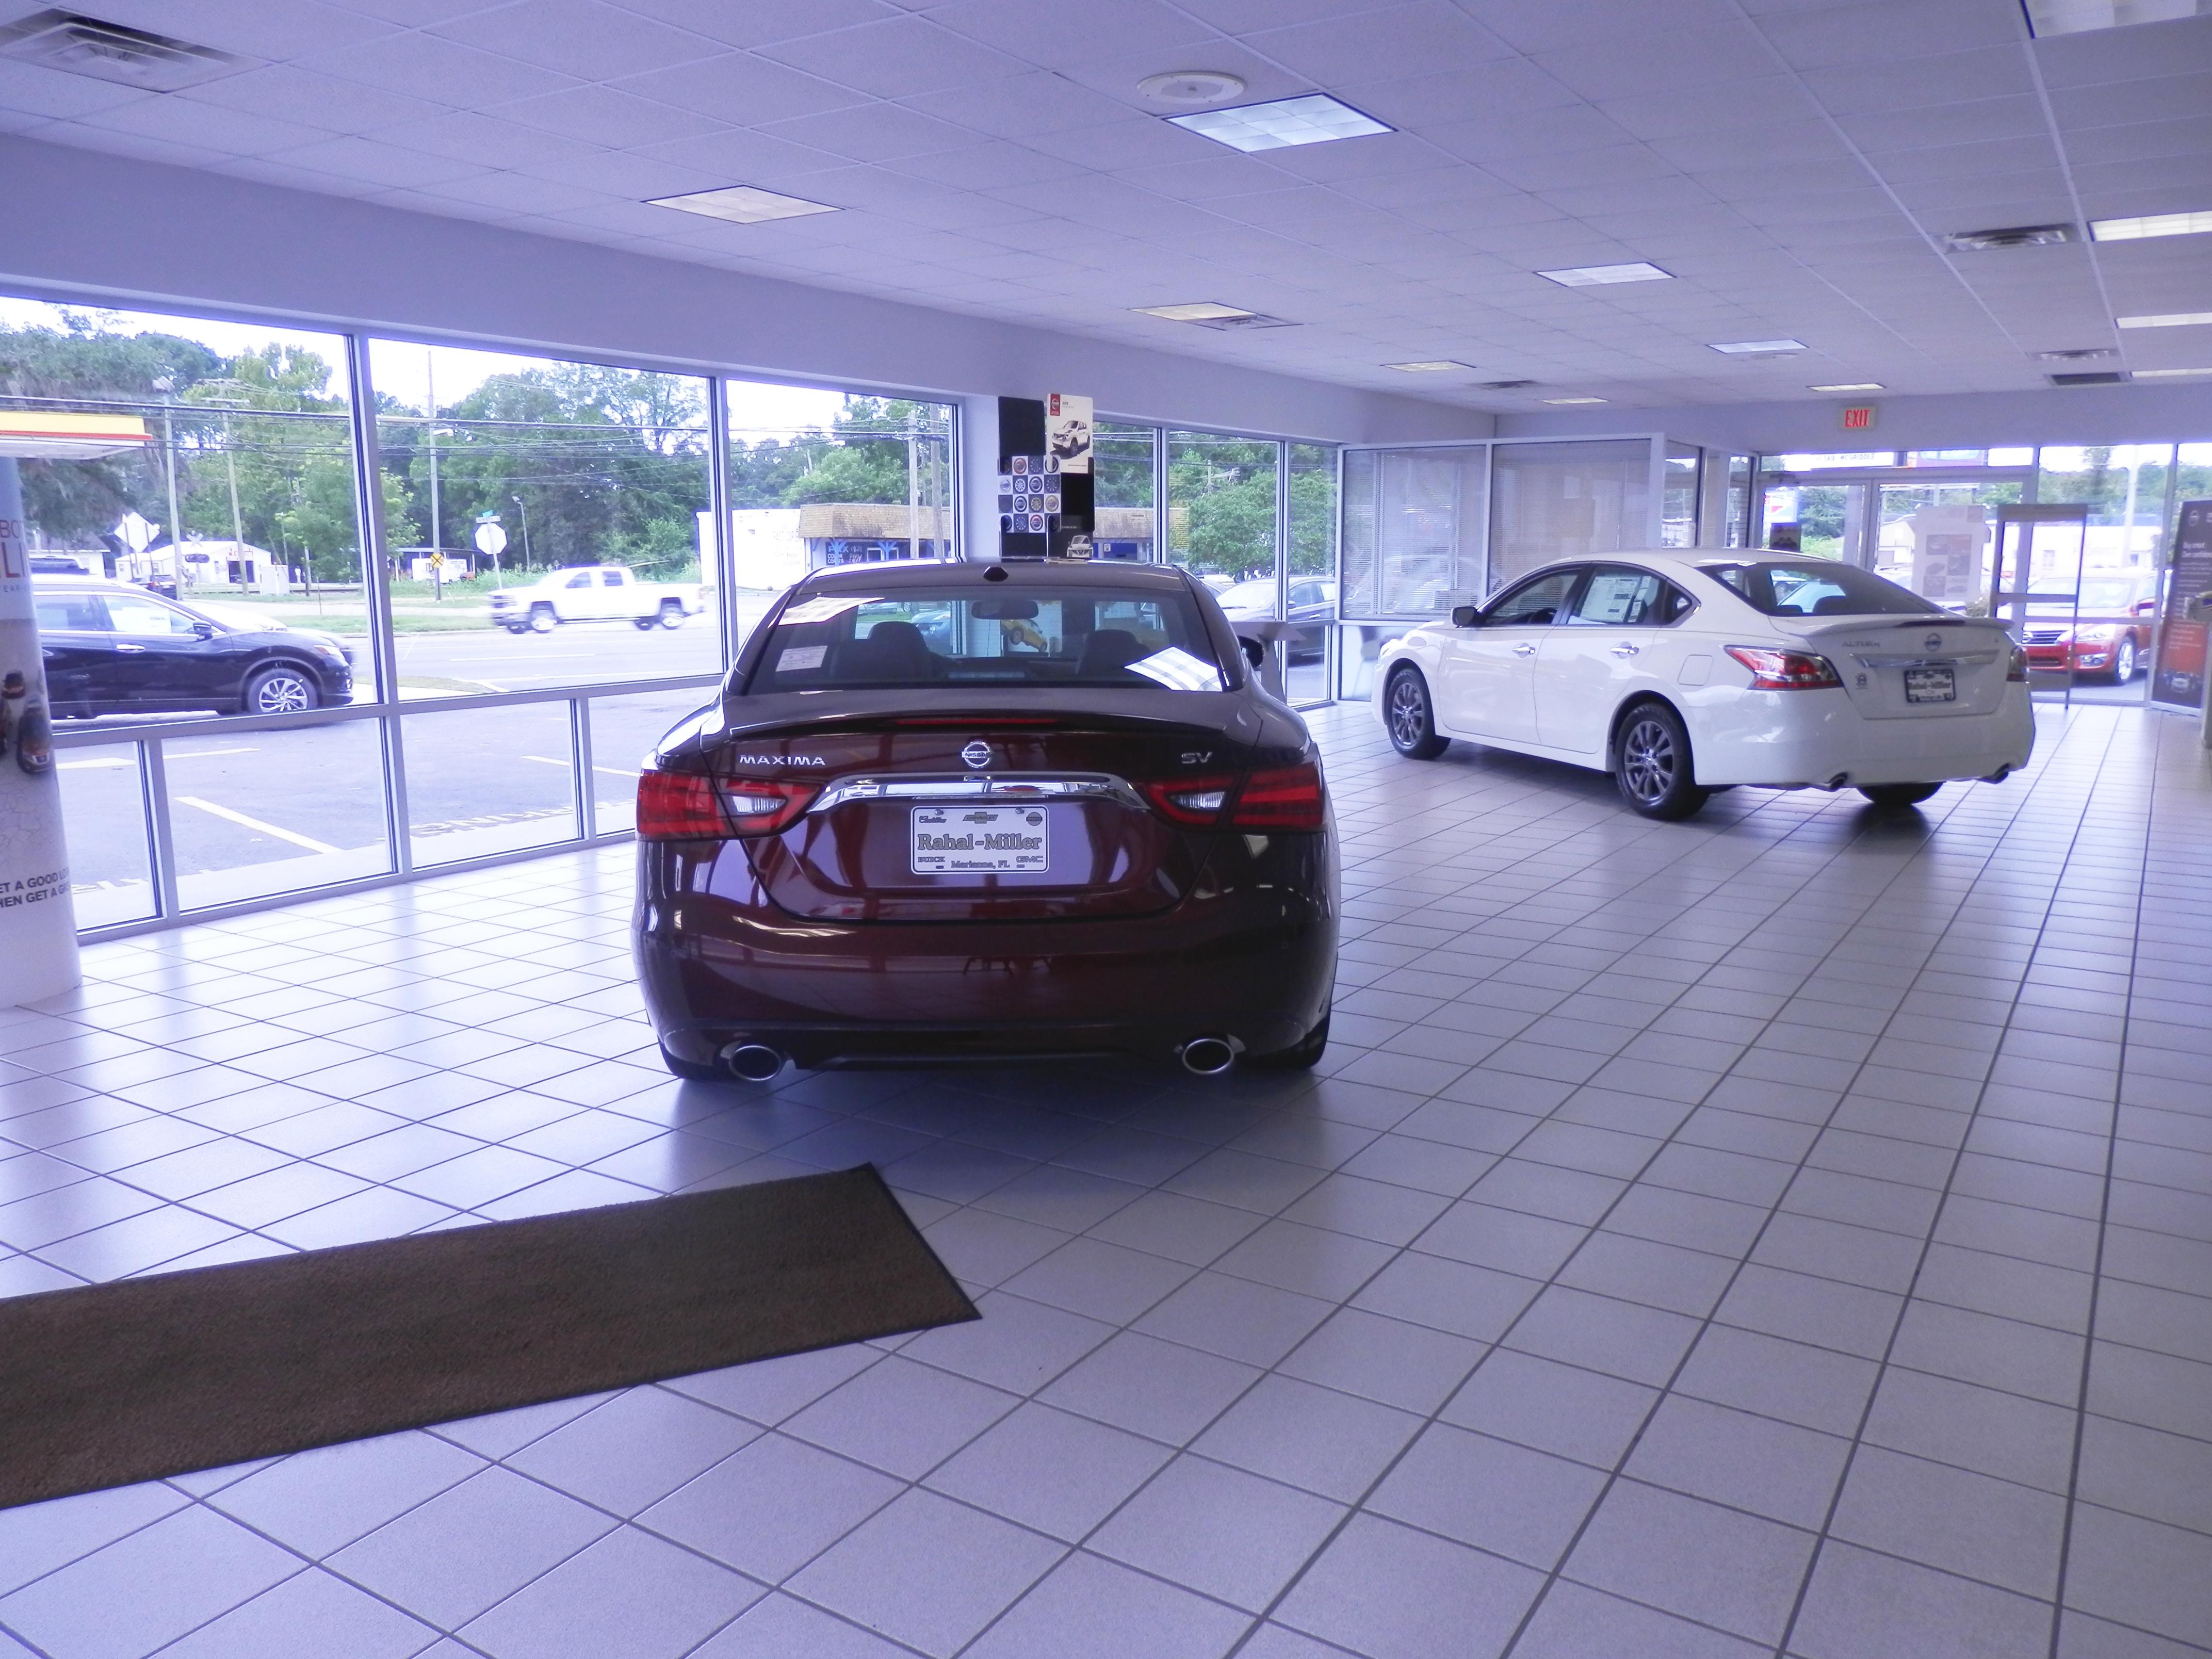 Rahal-Miller Nissan 4204 Lafayette St, Marianna, FL 32446 - YP.com